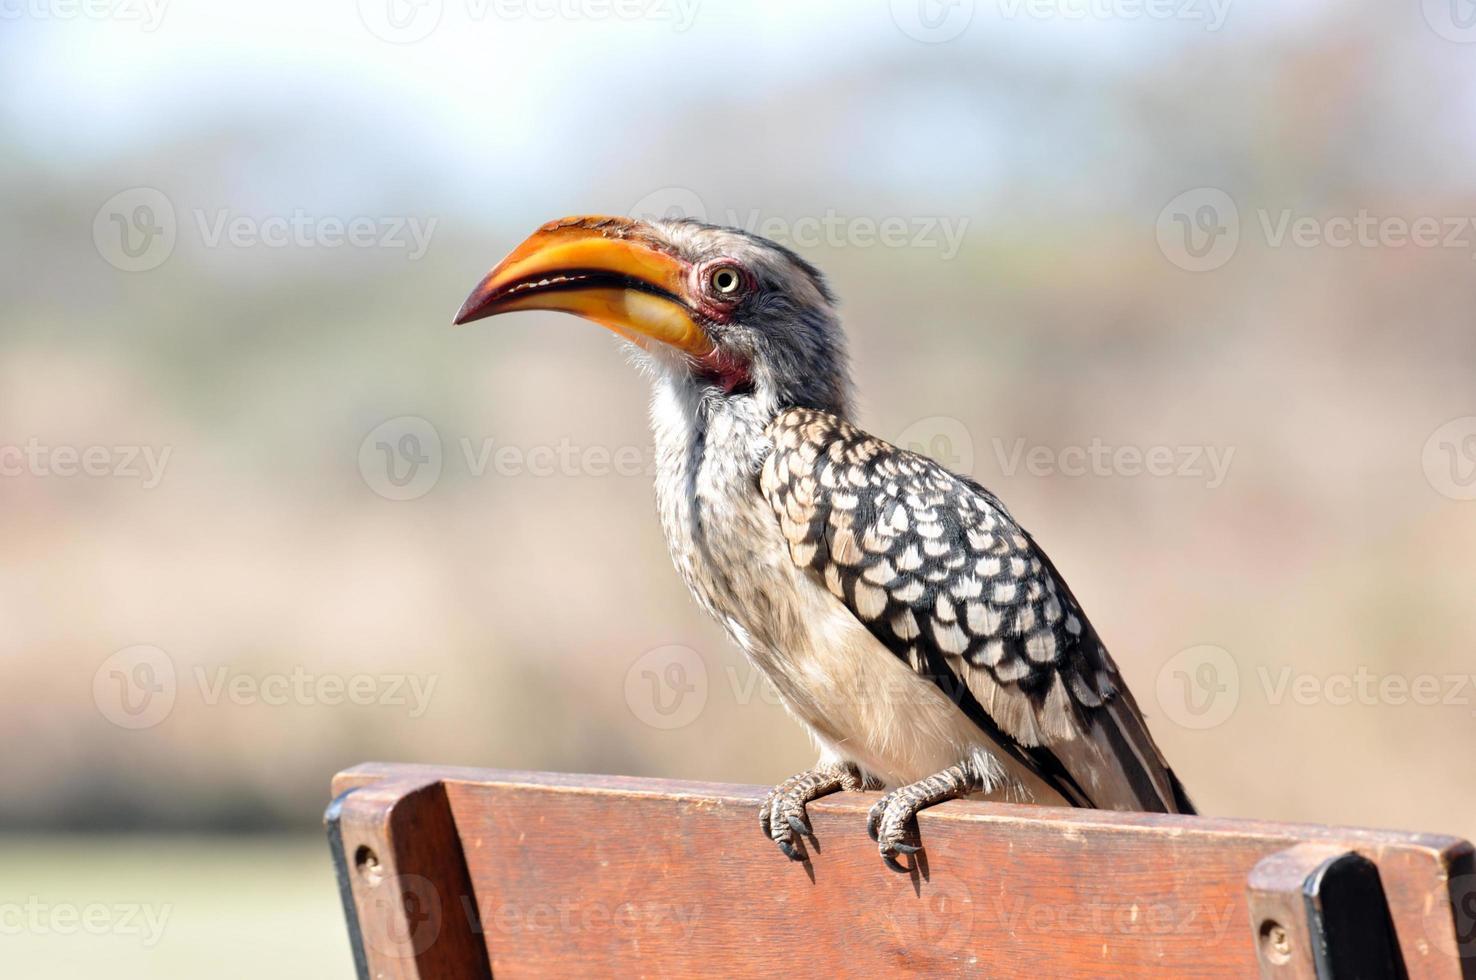 Southern Yellowbilled Hornbill photo